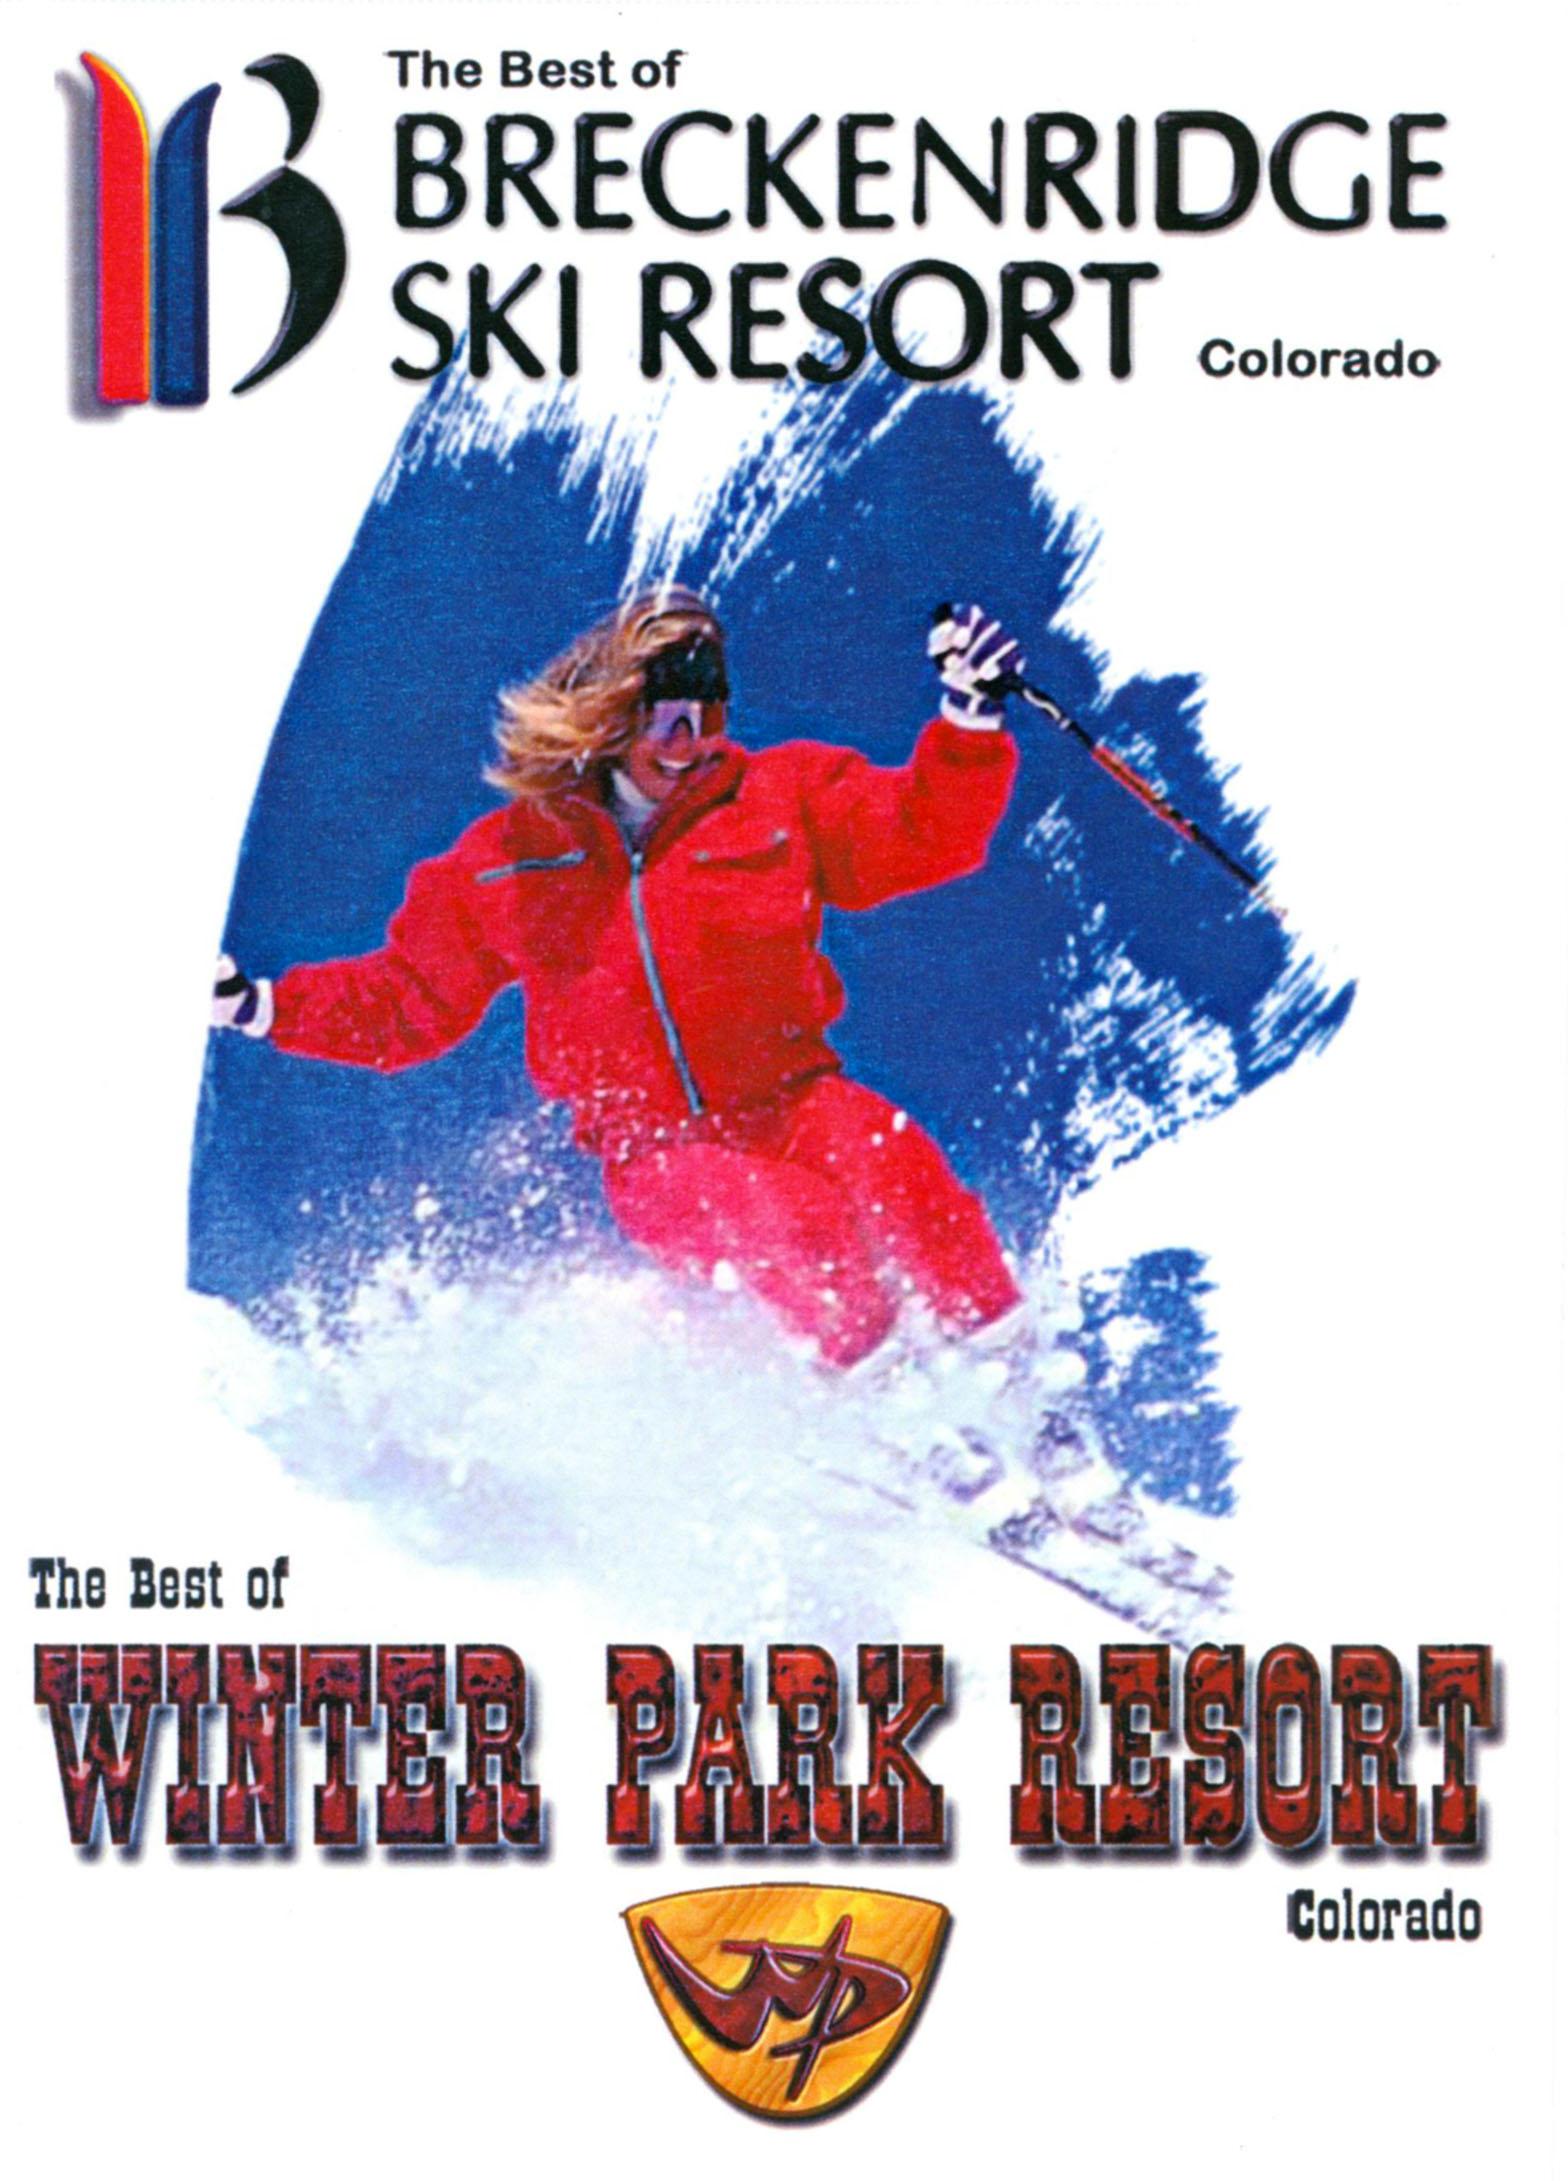 Breckenridge Ski Resort: Winter Park Resort